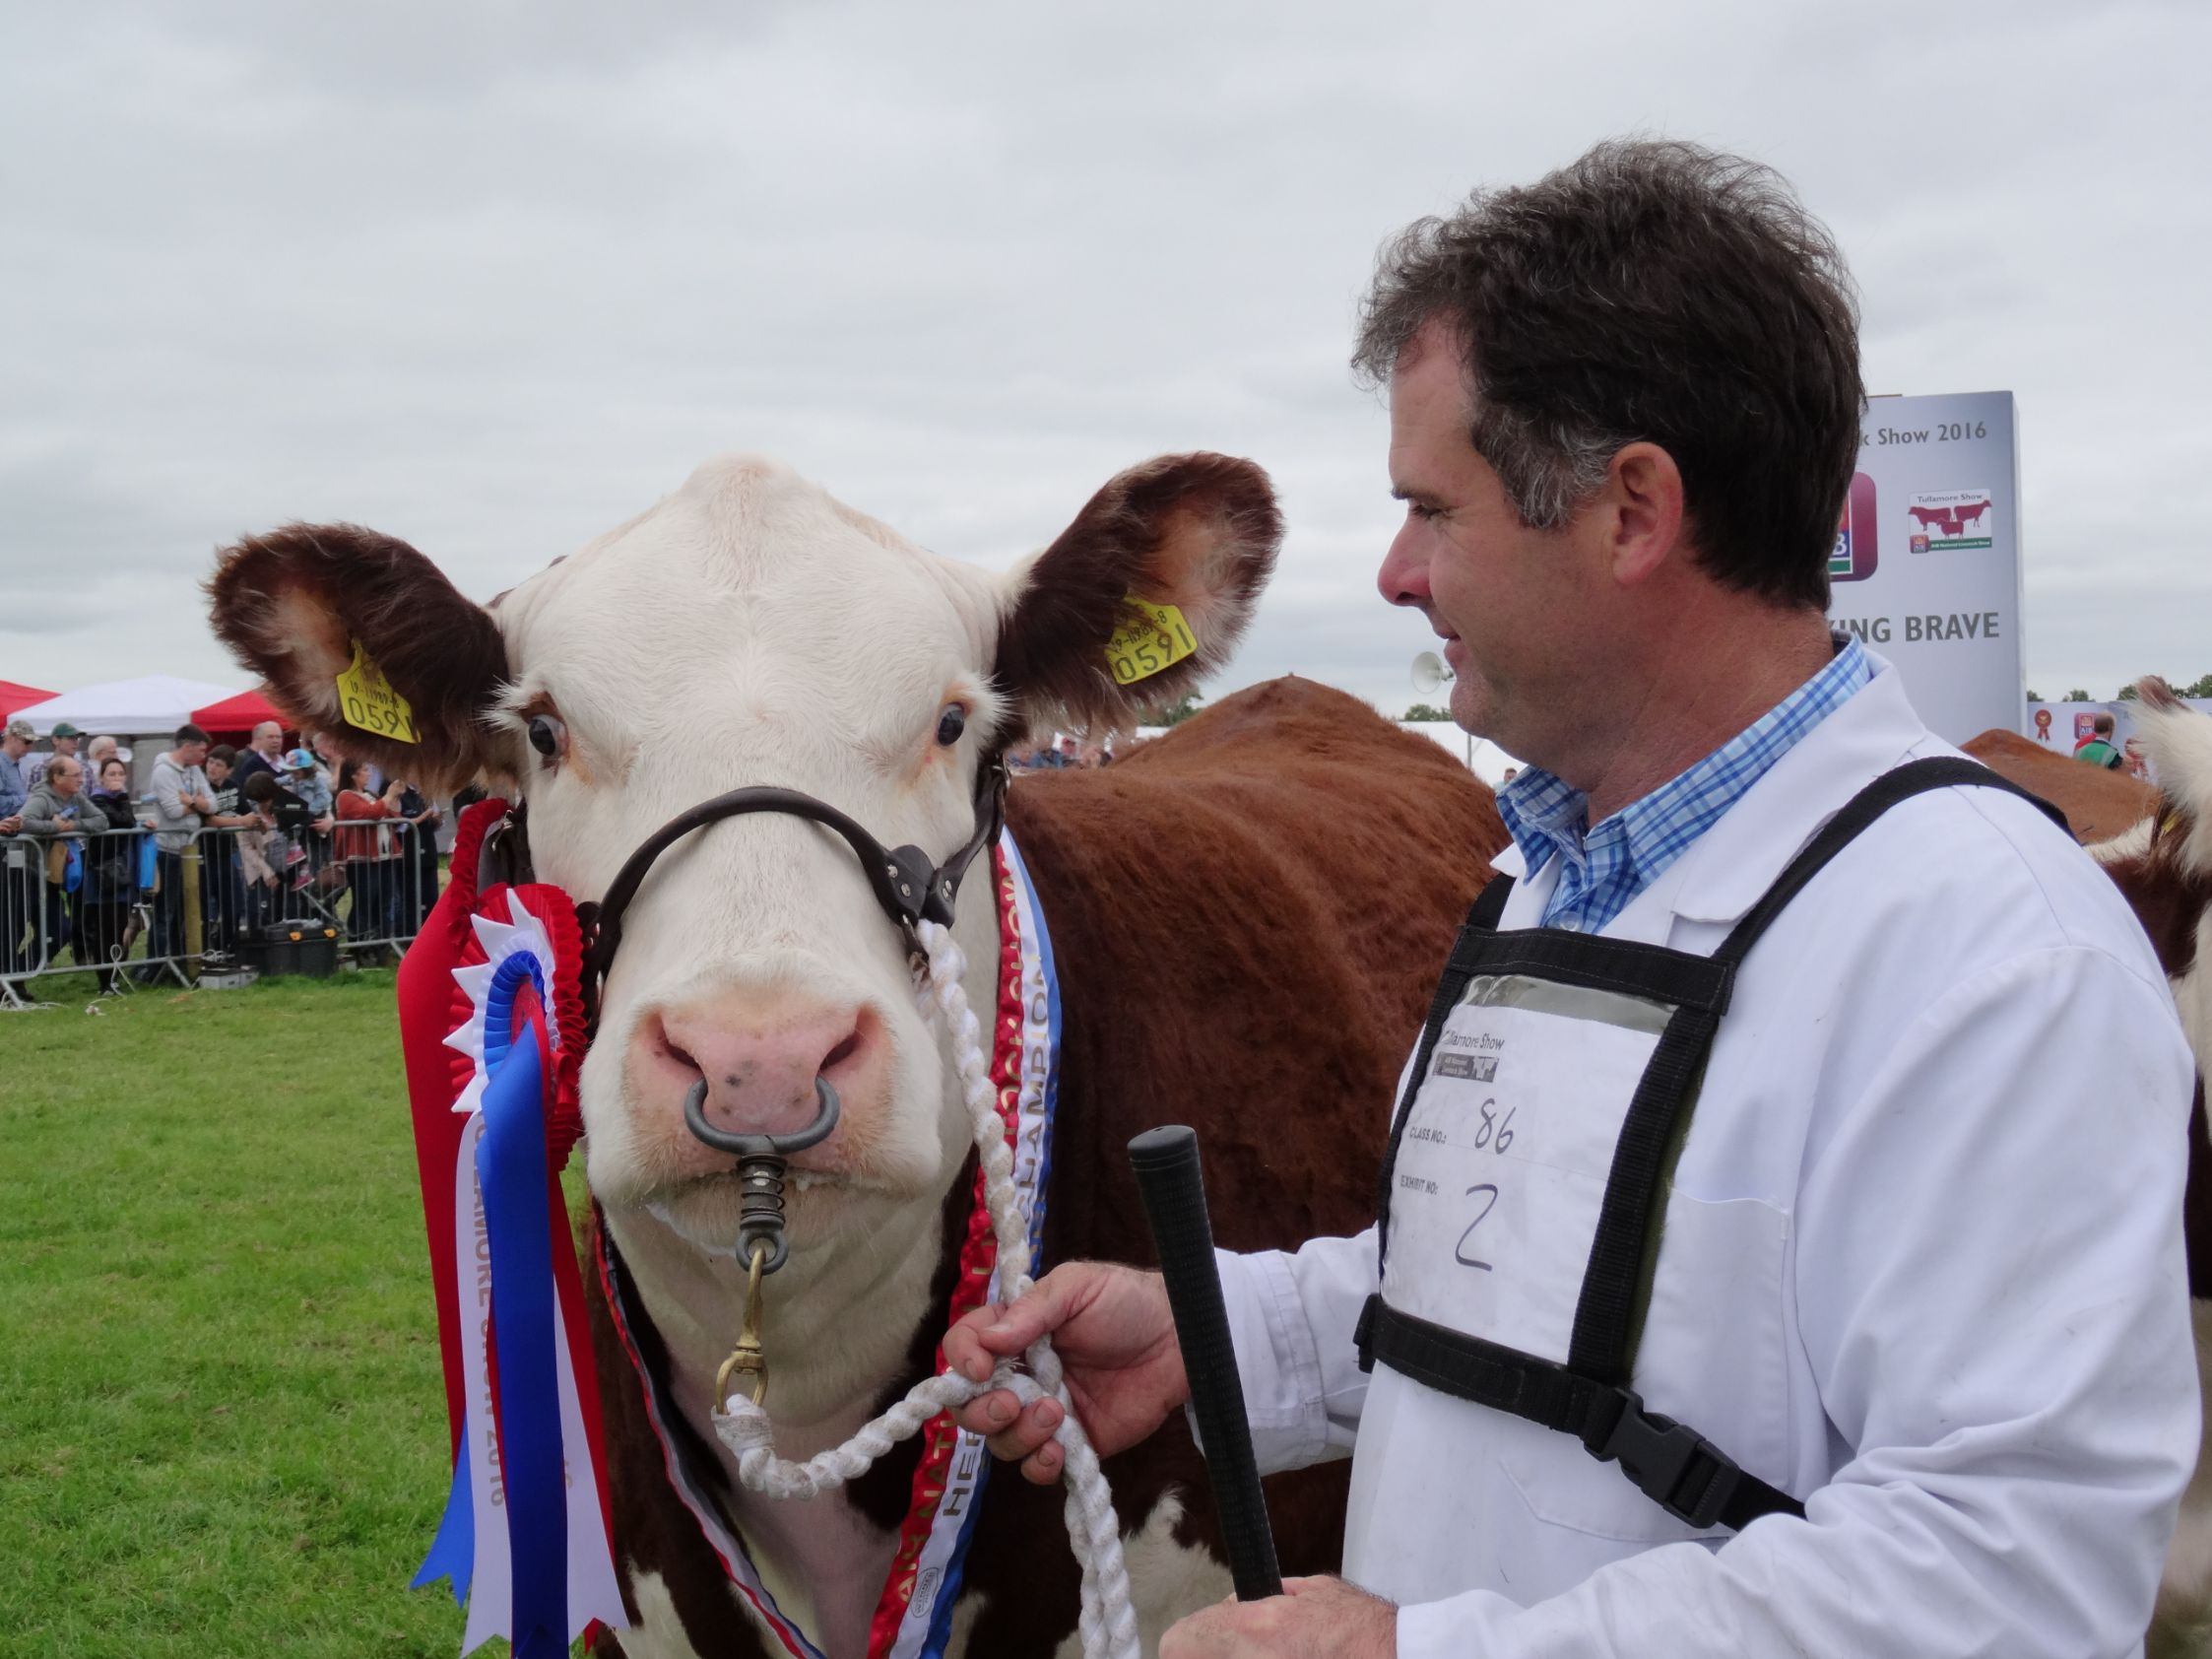 National Hereford Champion Gouldingpoll 1 Duchess, Hereford, polled Hereford cattle, pedigree breeding